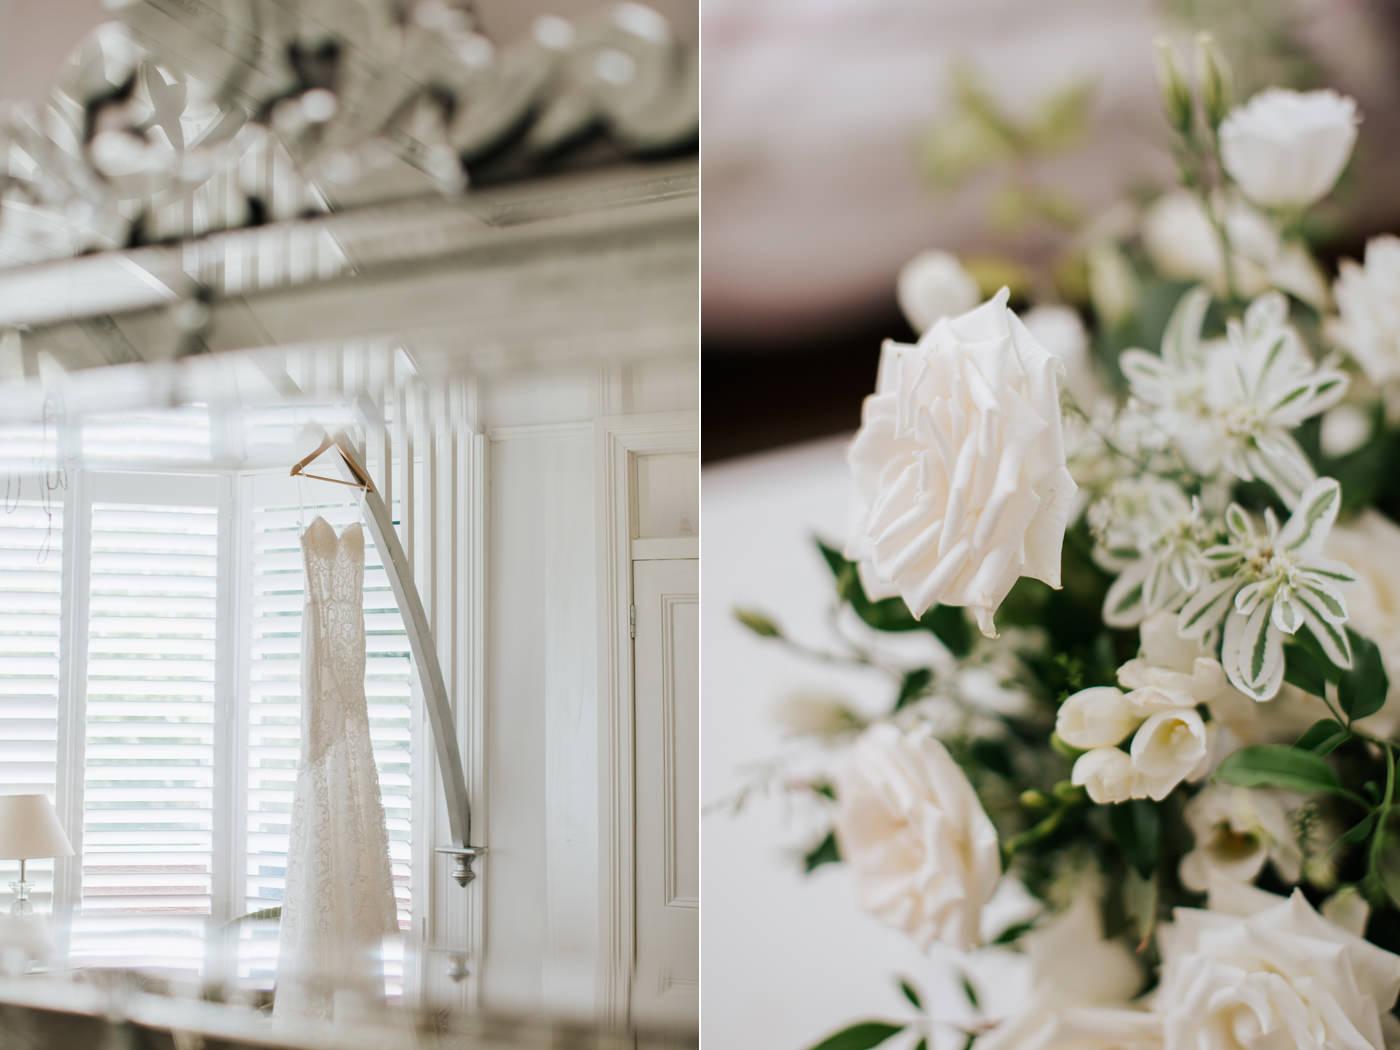 Nick & Vanezza - Fernbank Farm Wedding - Samantha Heather Photography-17.jpg